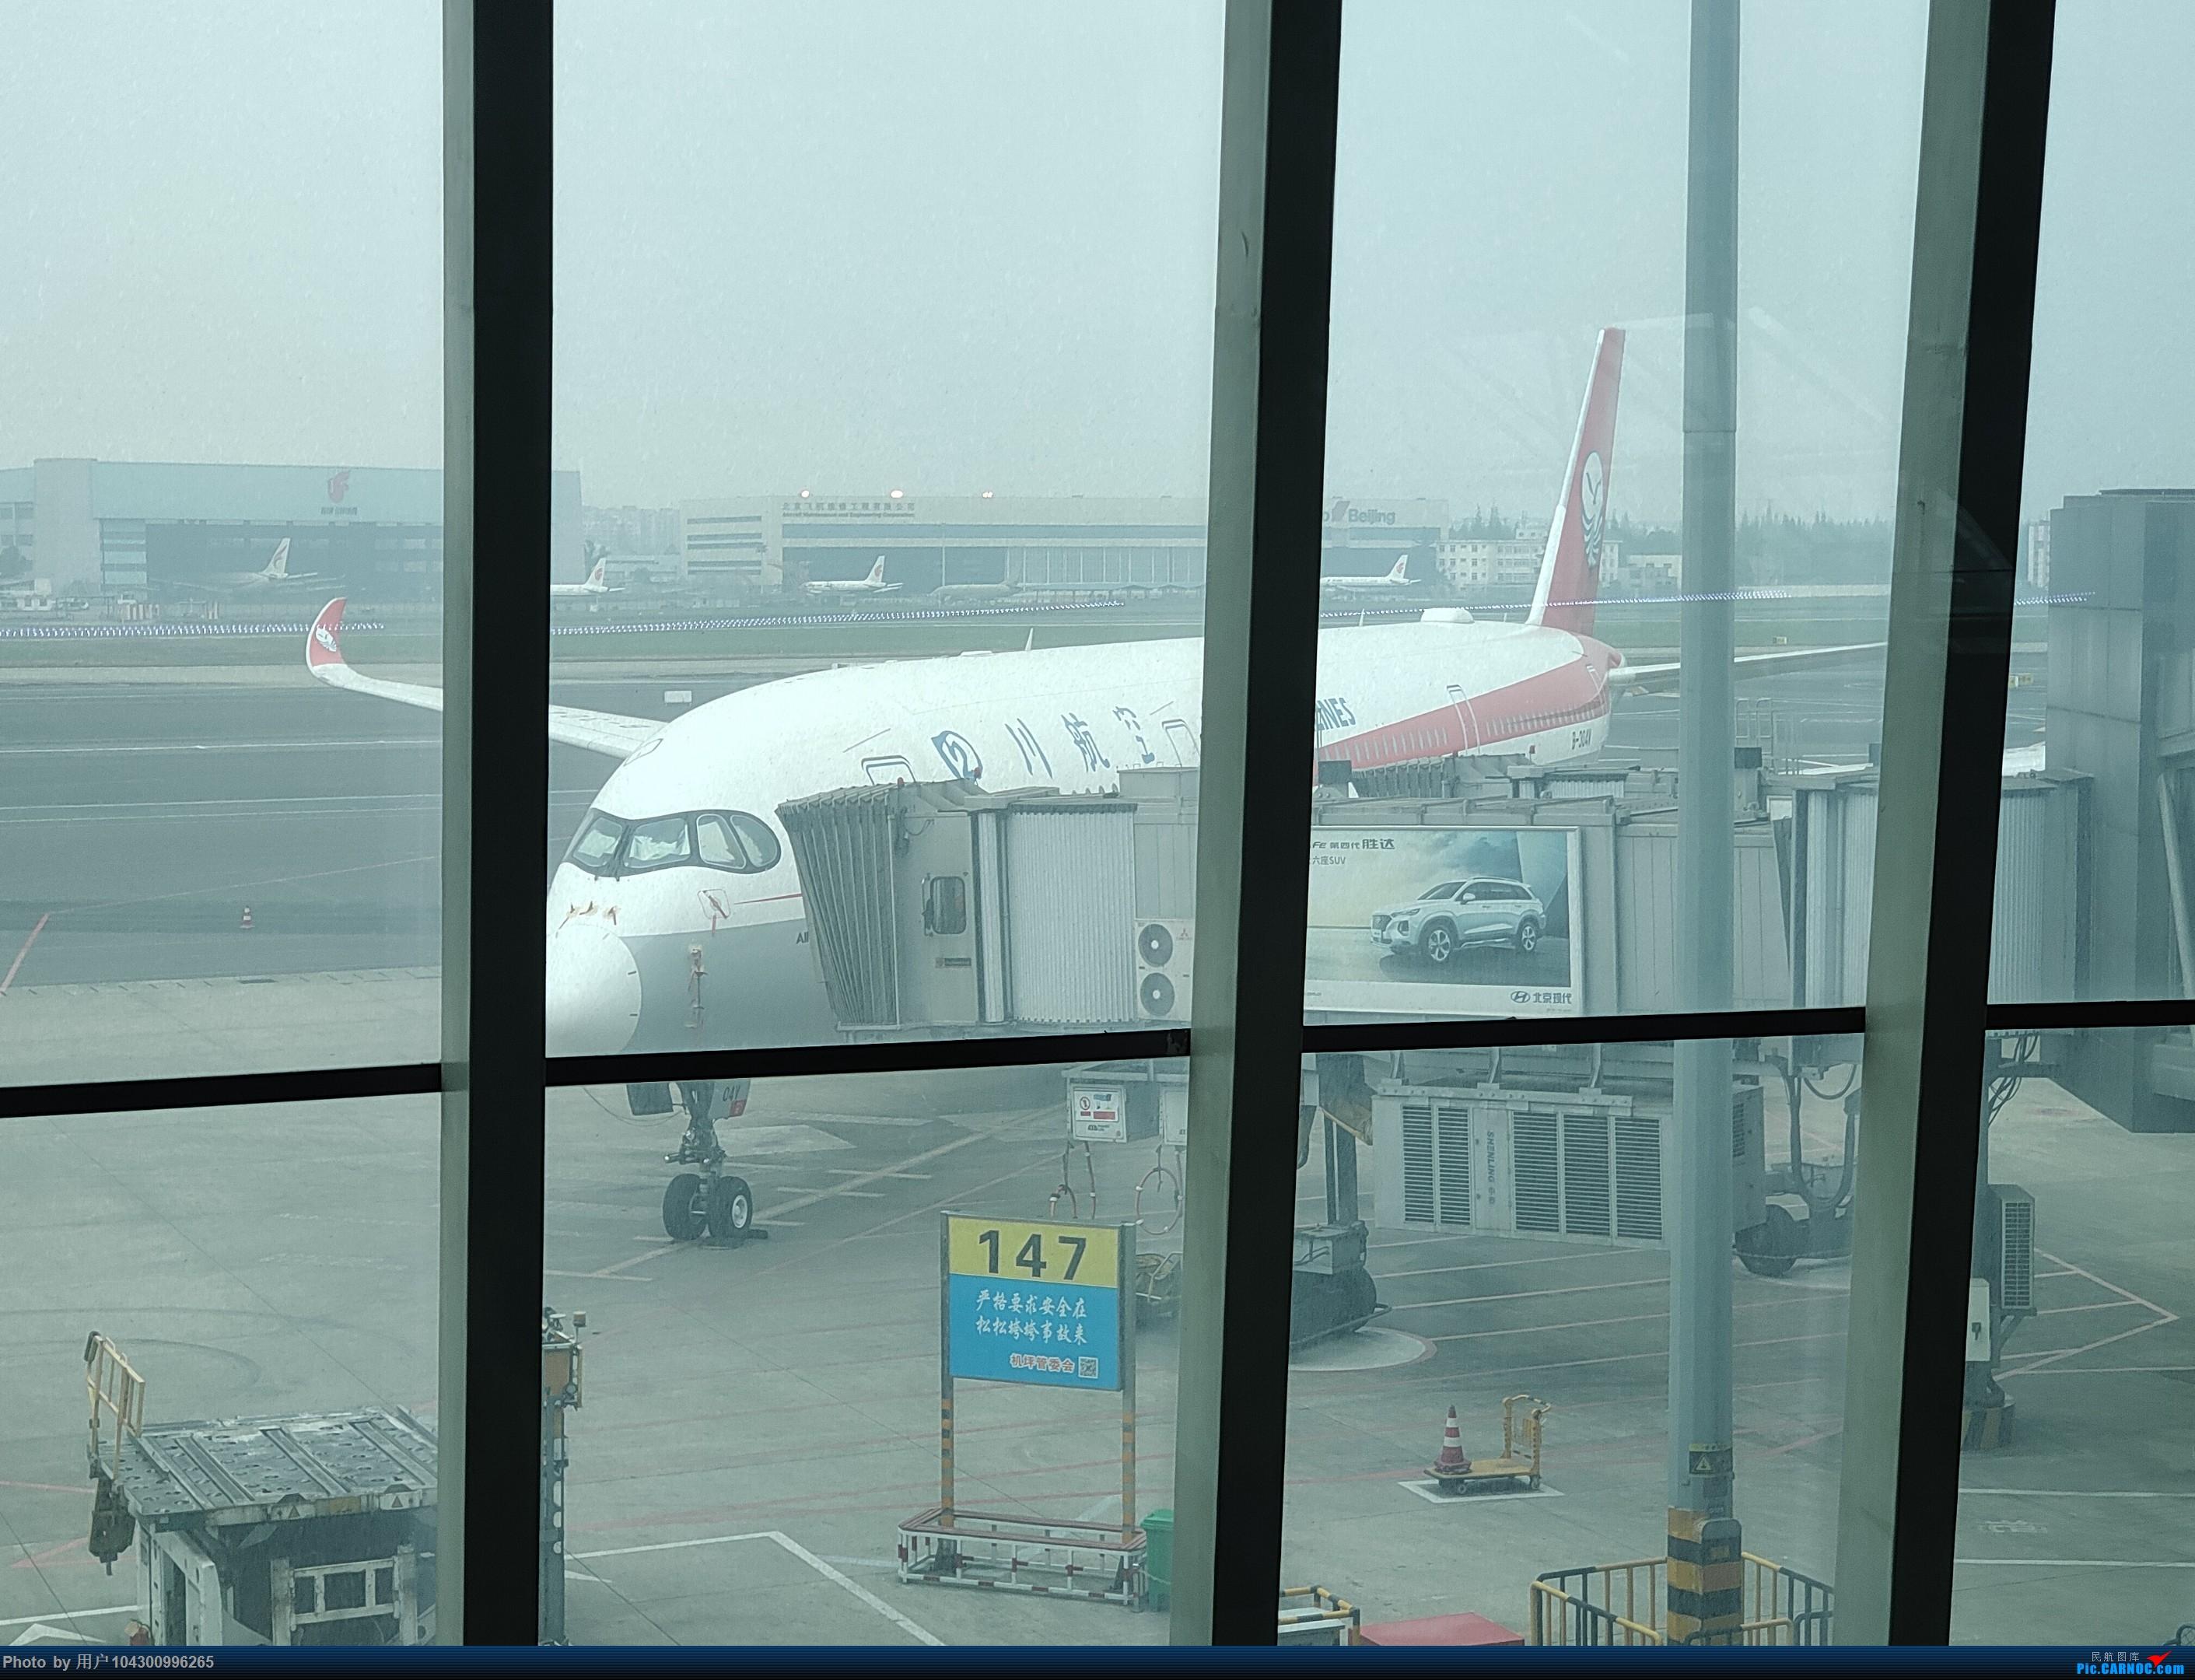 Re:[原创]DM游记之GY贵阳-成都往返(参观空港花田) AIRBUS A320NEO B-304Y 中国成都双流国际机场 中国成都双流国际机场